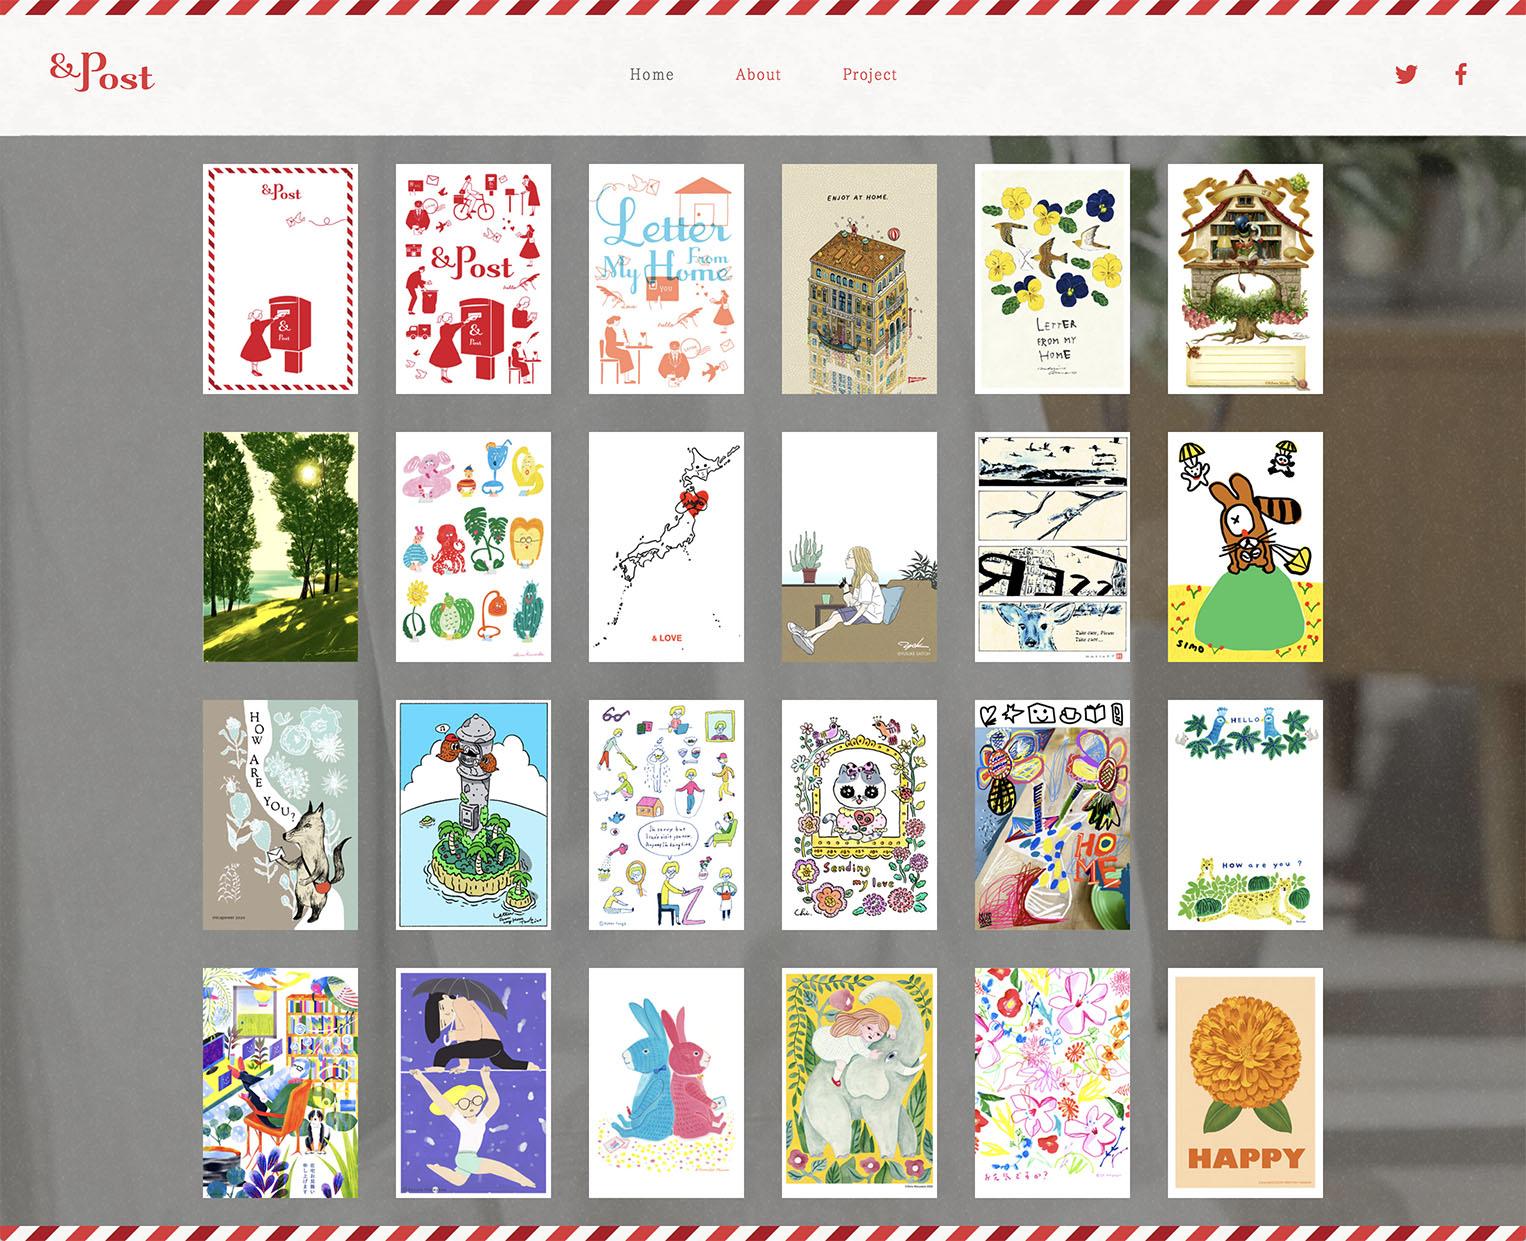 &POST ポストカード 手紙 日本郵政 お手紙帰省